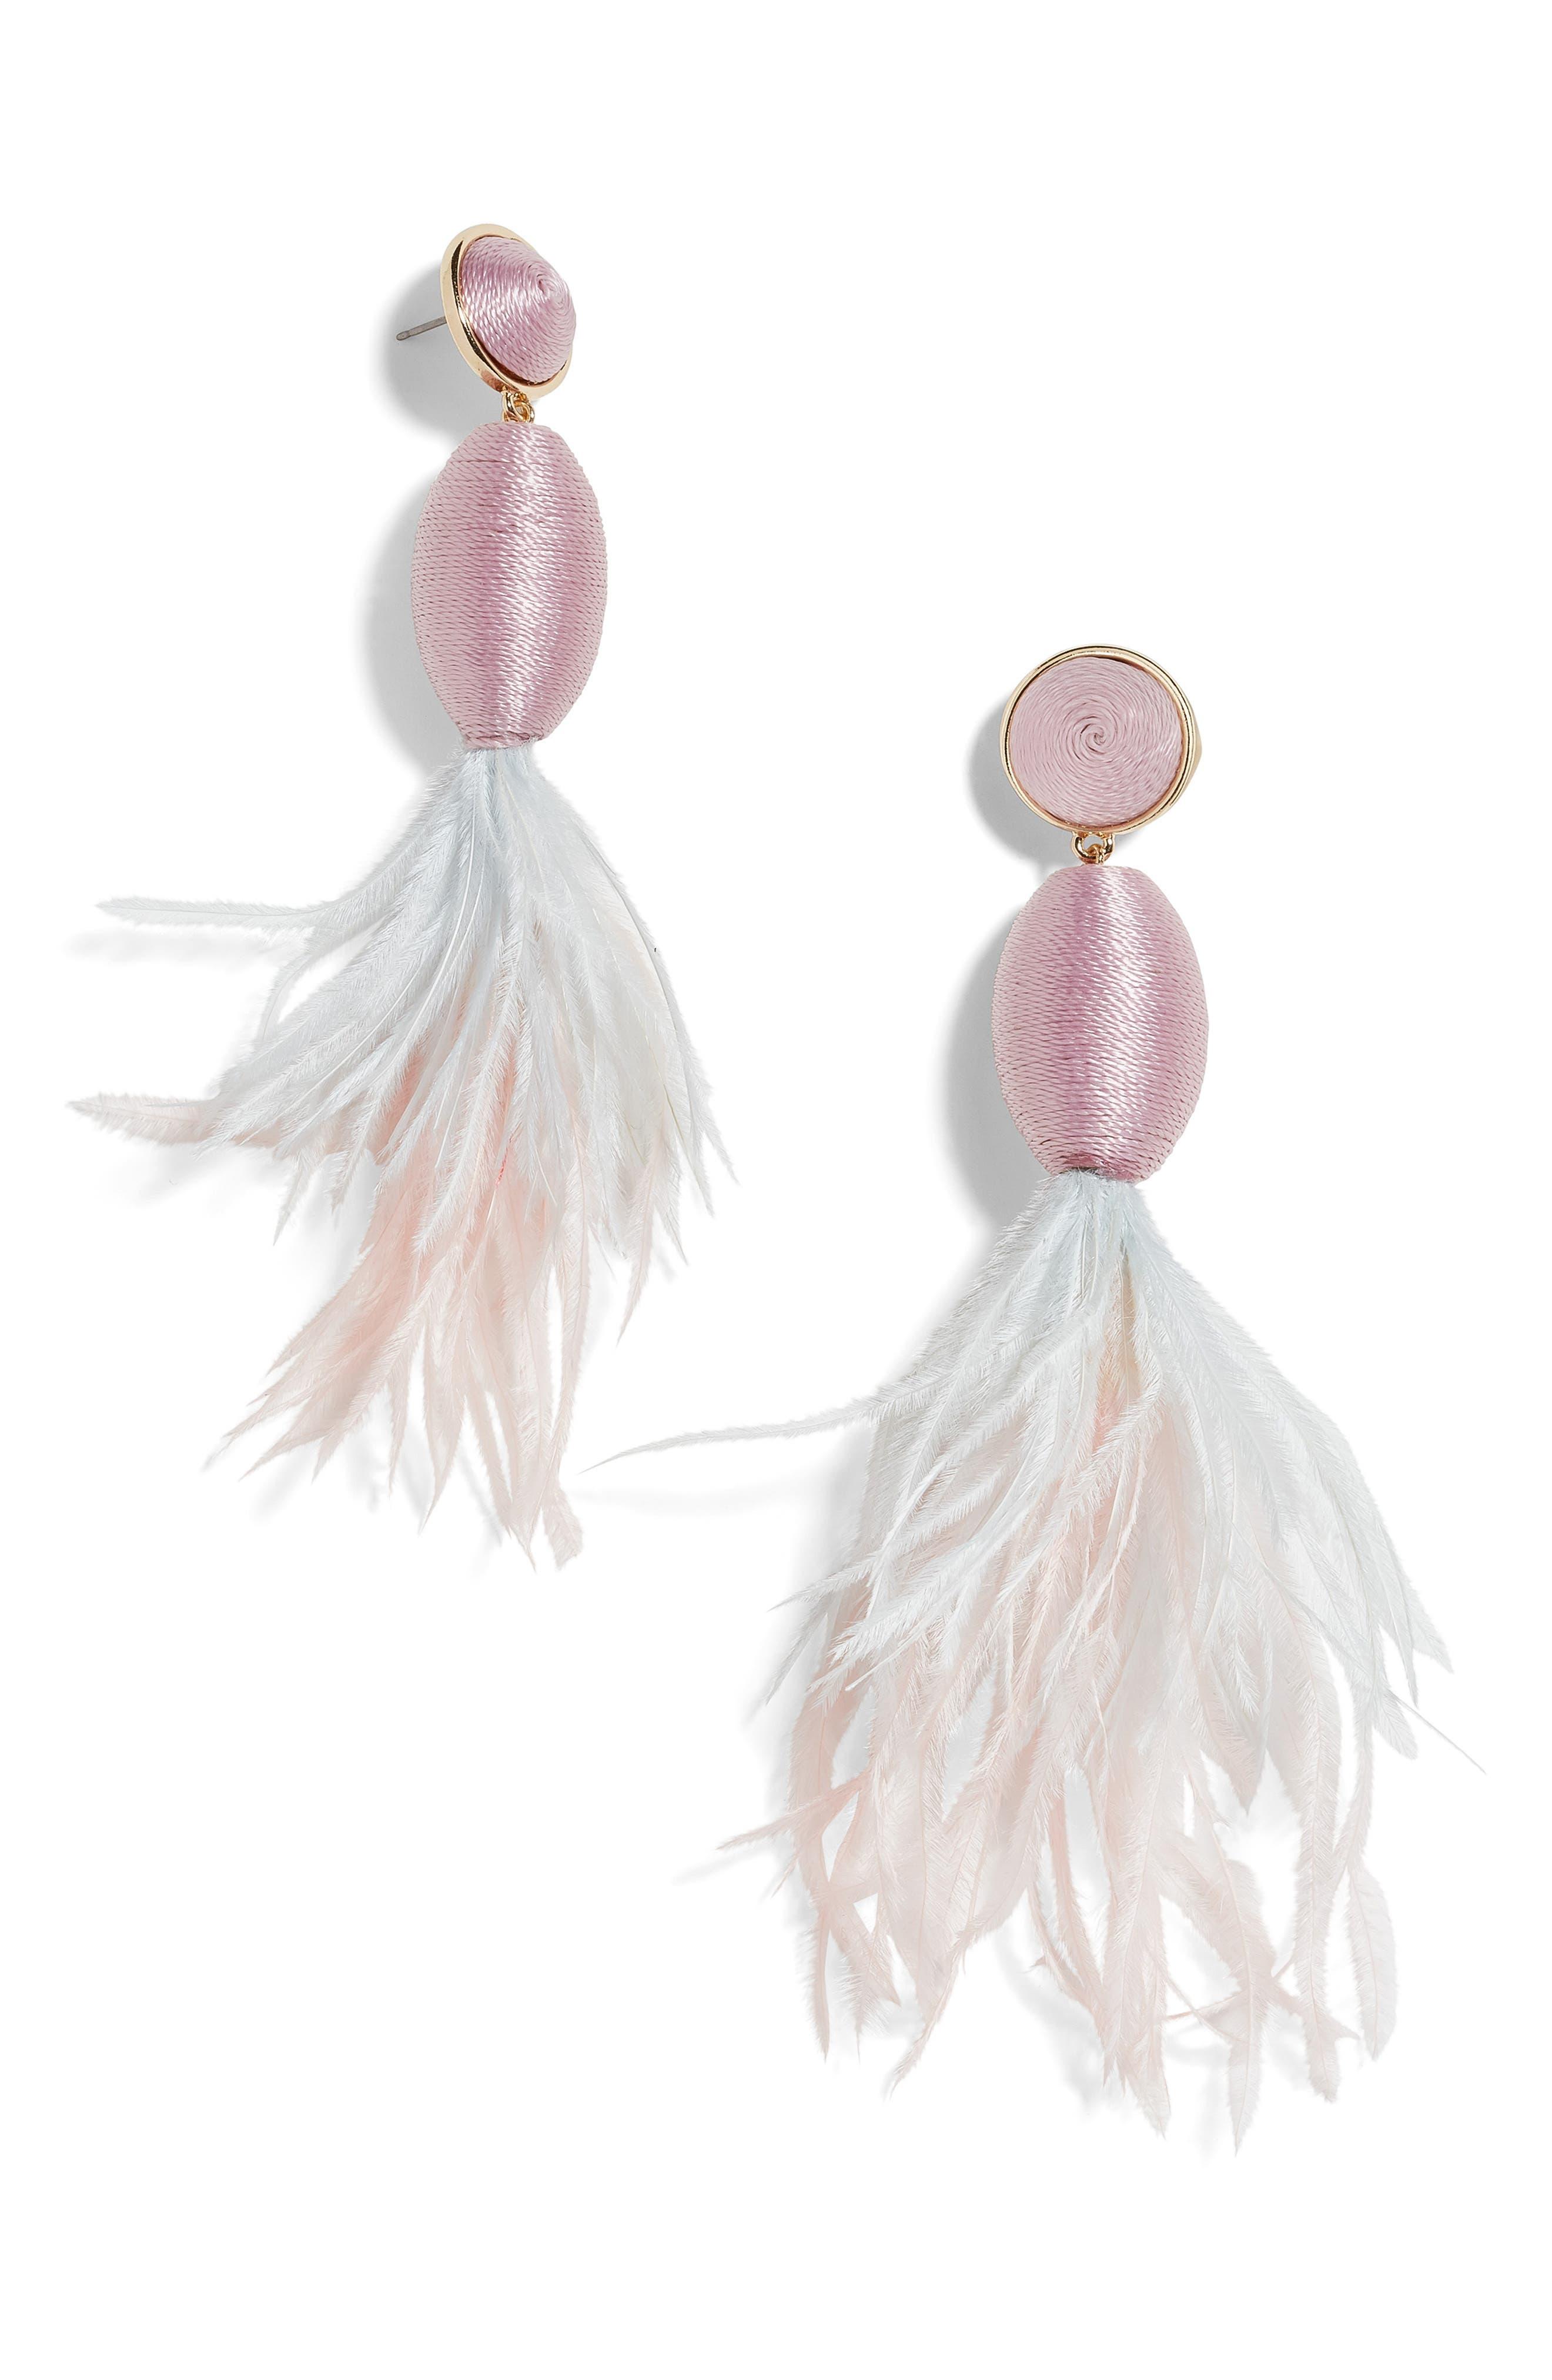 BAUBLEBAR, Fianna Feather Drop Earrings, Main thumbnail 1, color, LAVENDER